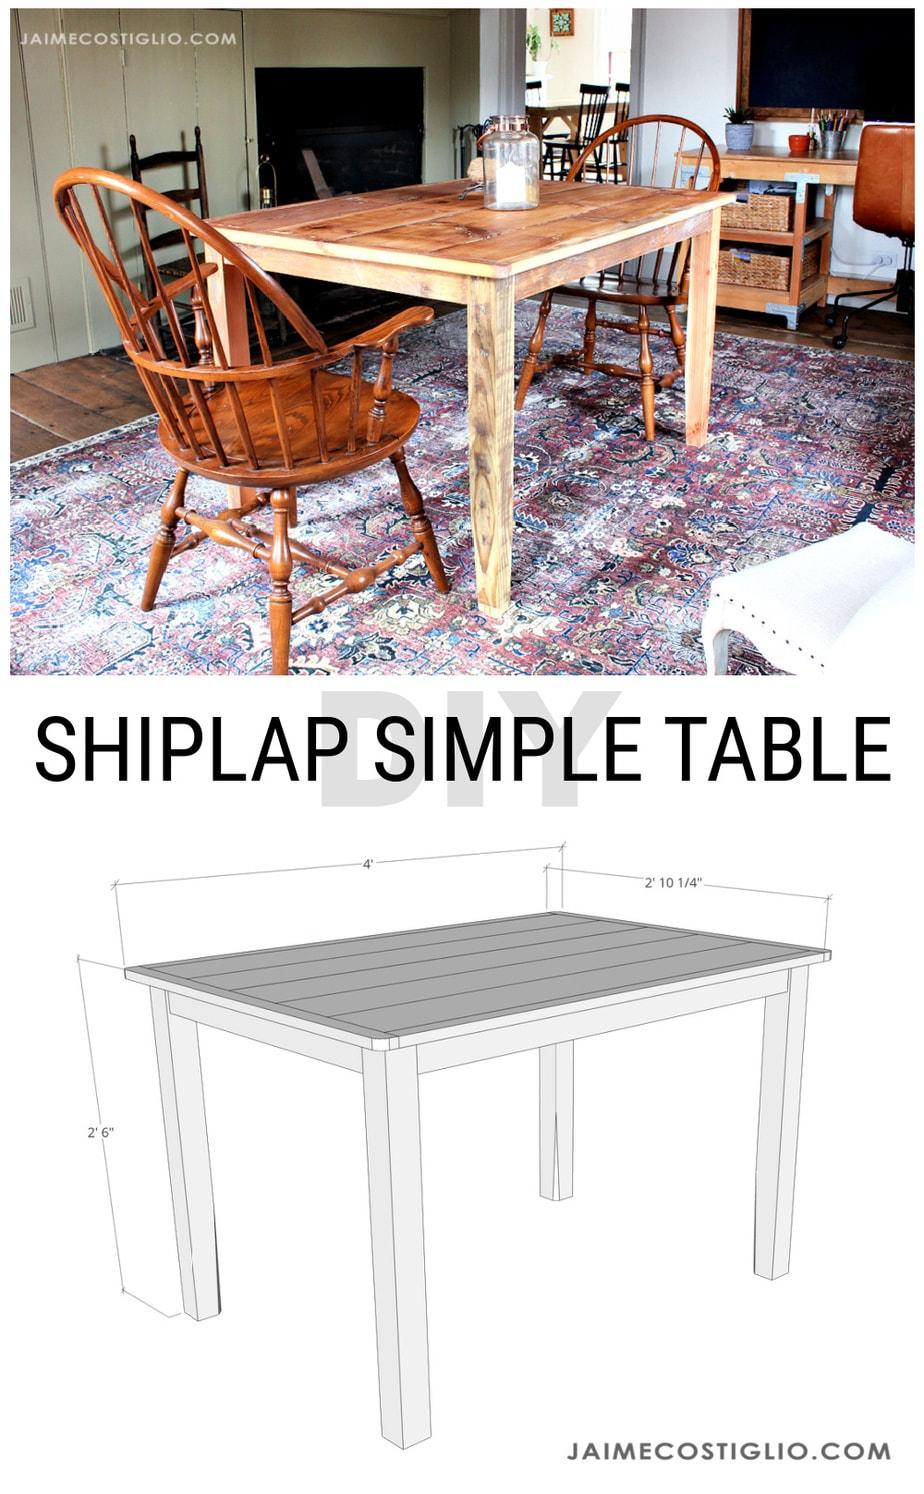 shiplap style table plans